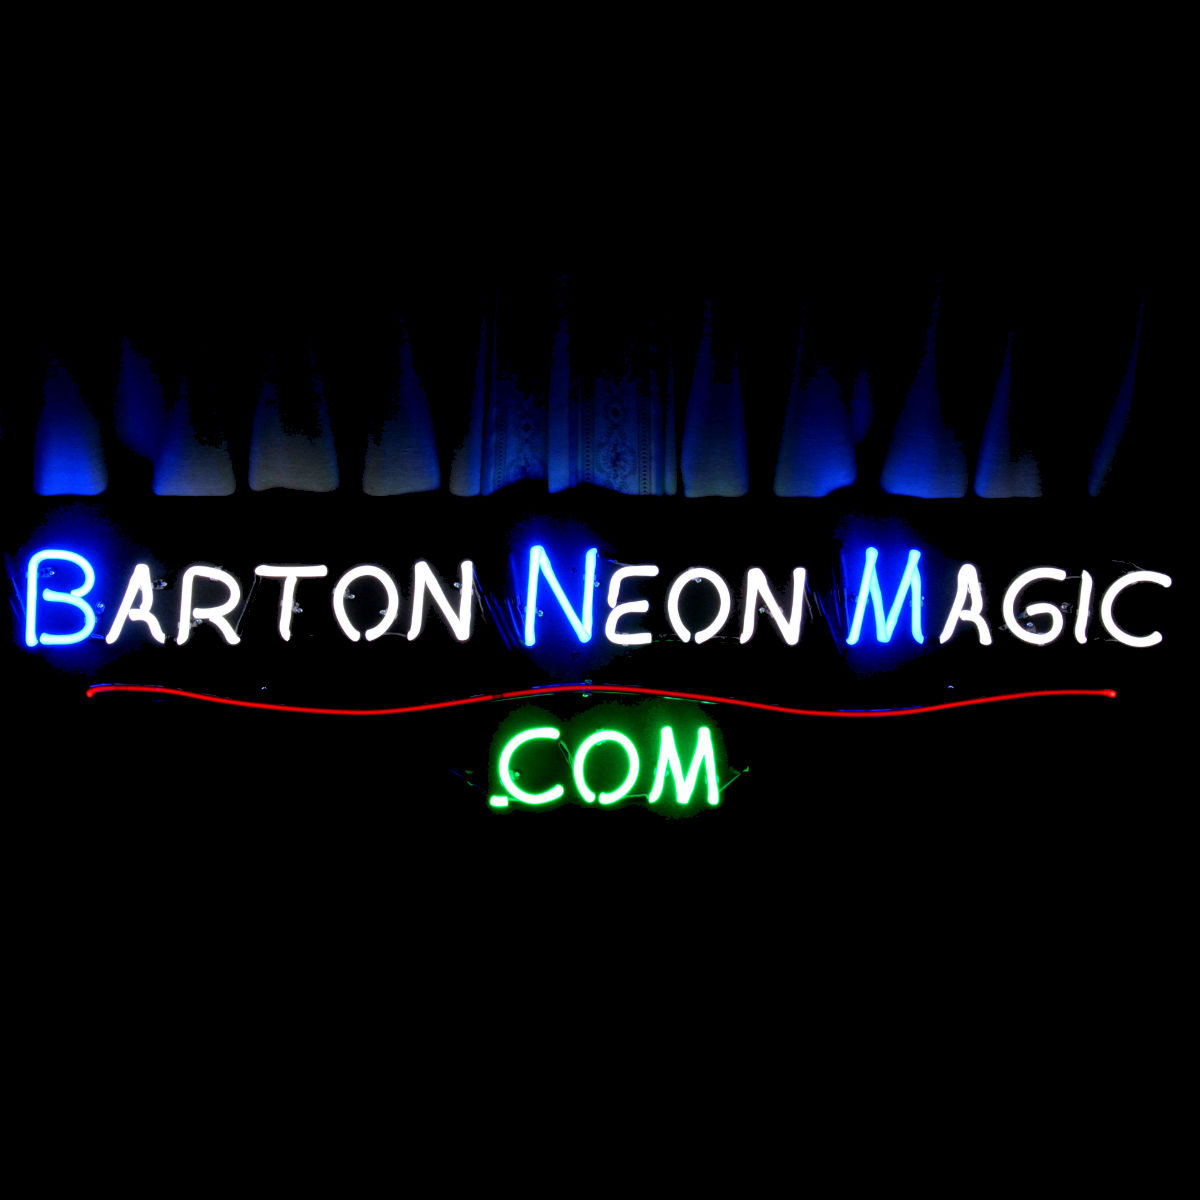 Custom Neon Lighting by John Barton - Internationally Famous USA Neon Light Sculptor